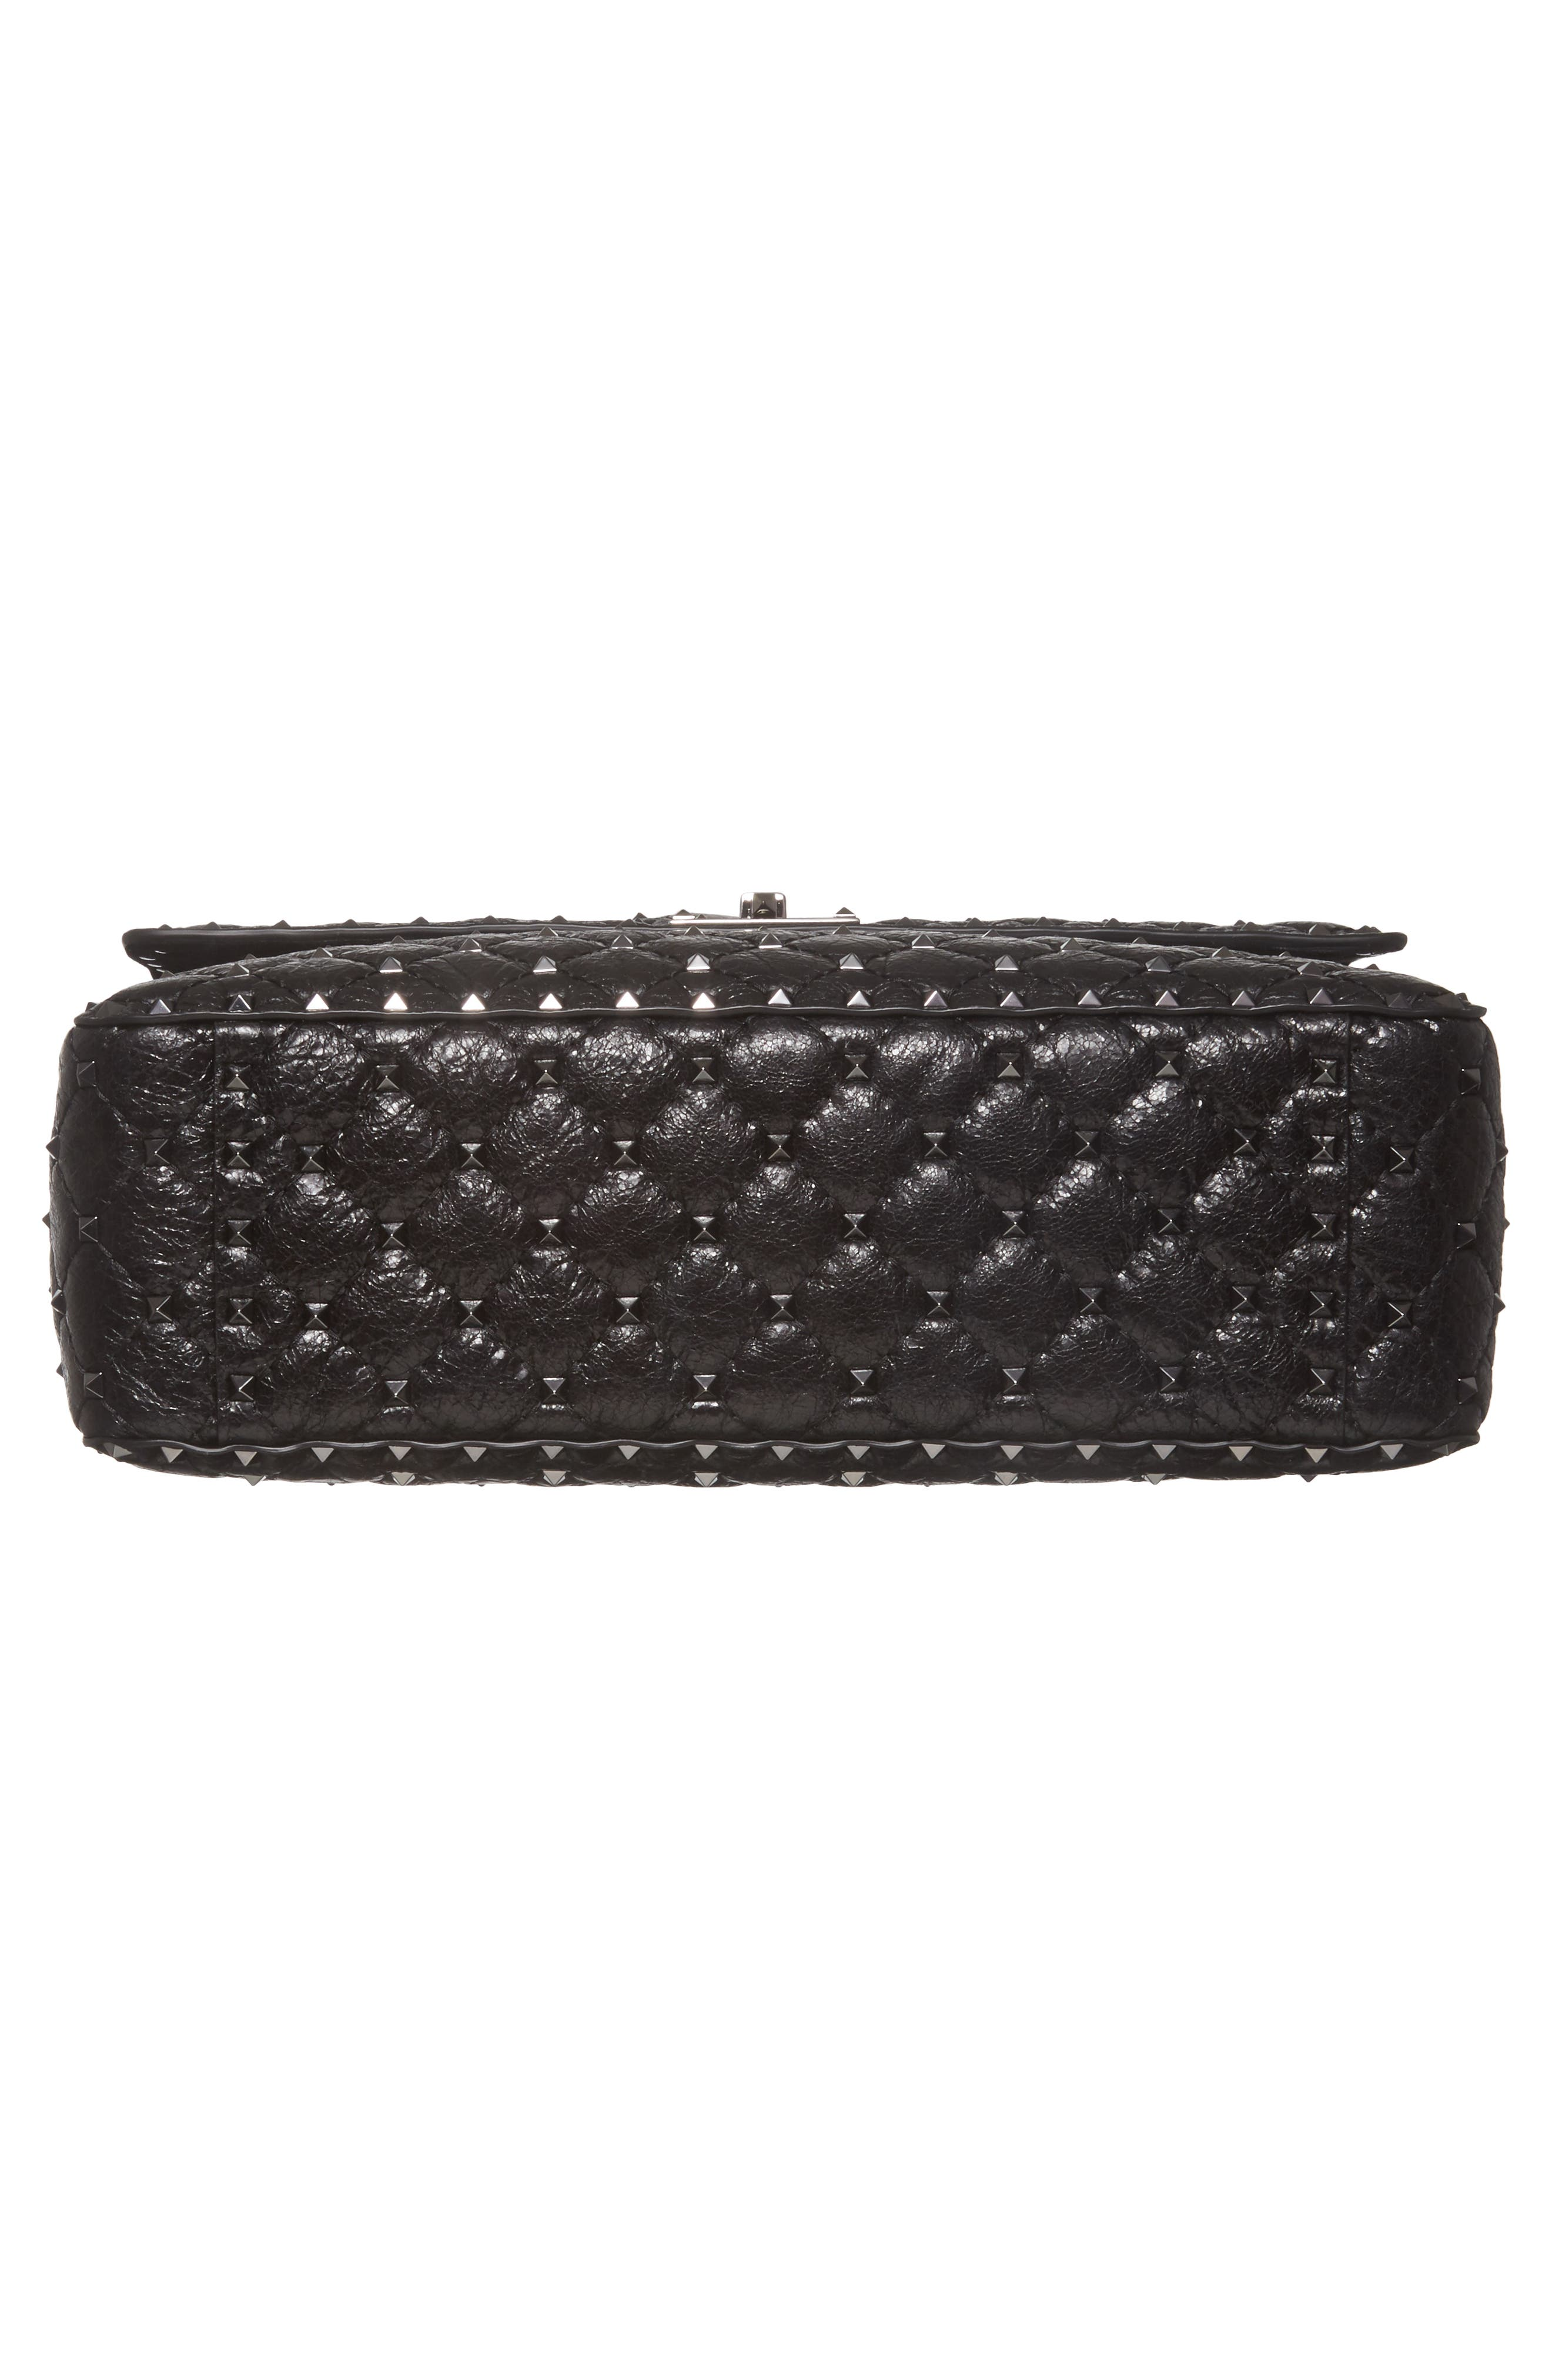 Vitello Rockstud Lambskin Leather Shoulder Bag,                             Alternate thumbnail 6, color,                             001